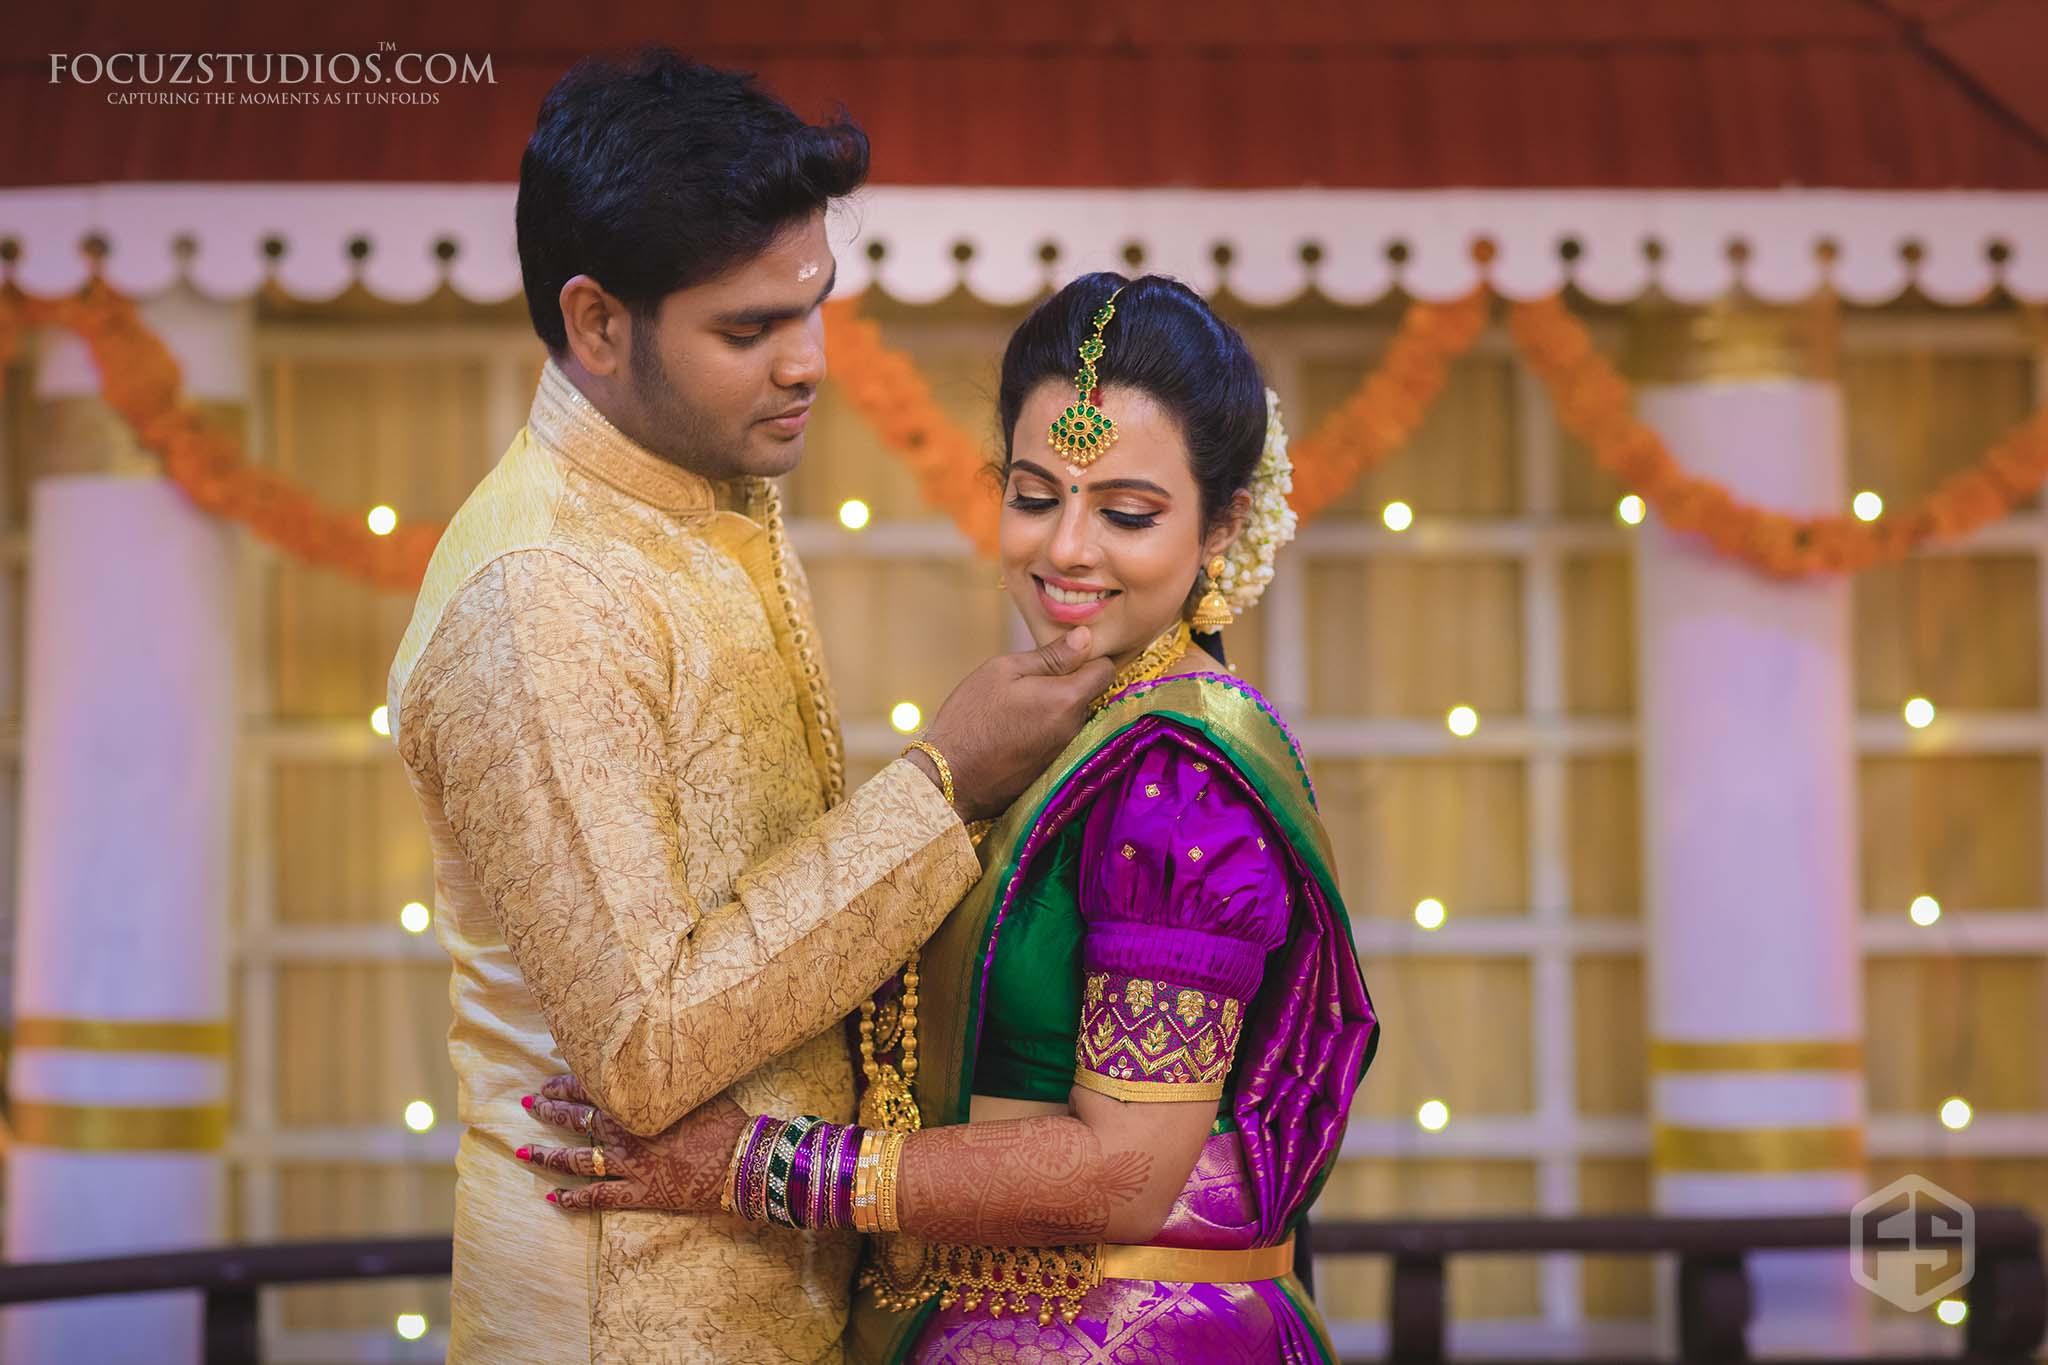 Wedding Photography Rates In Kerala: Kerala Falling In Love With Tamilnadu